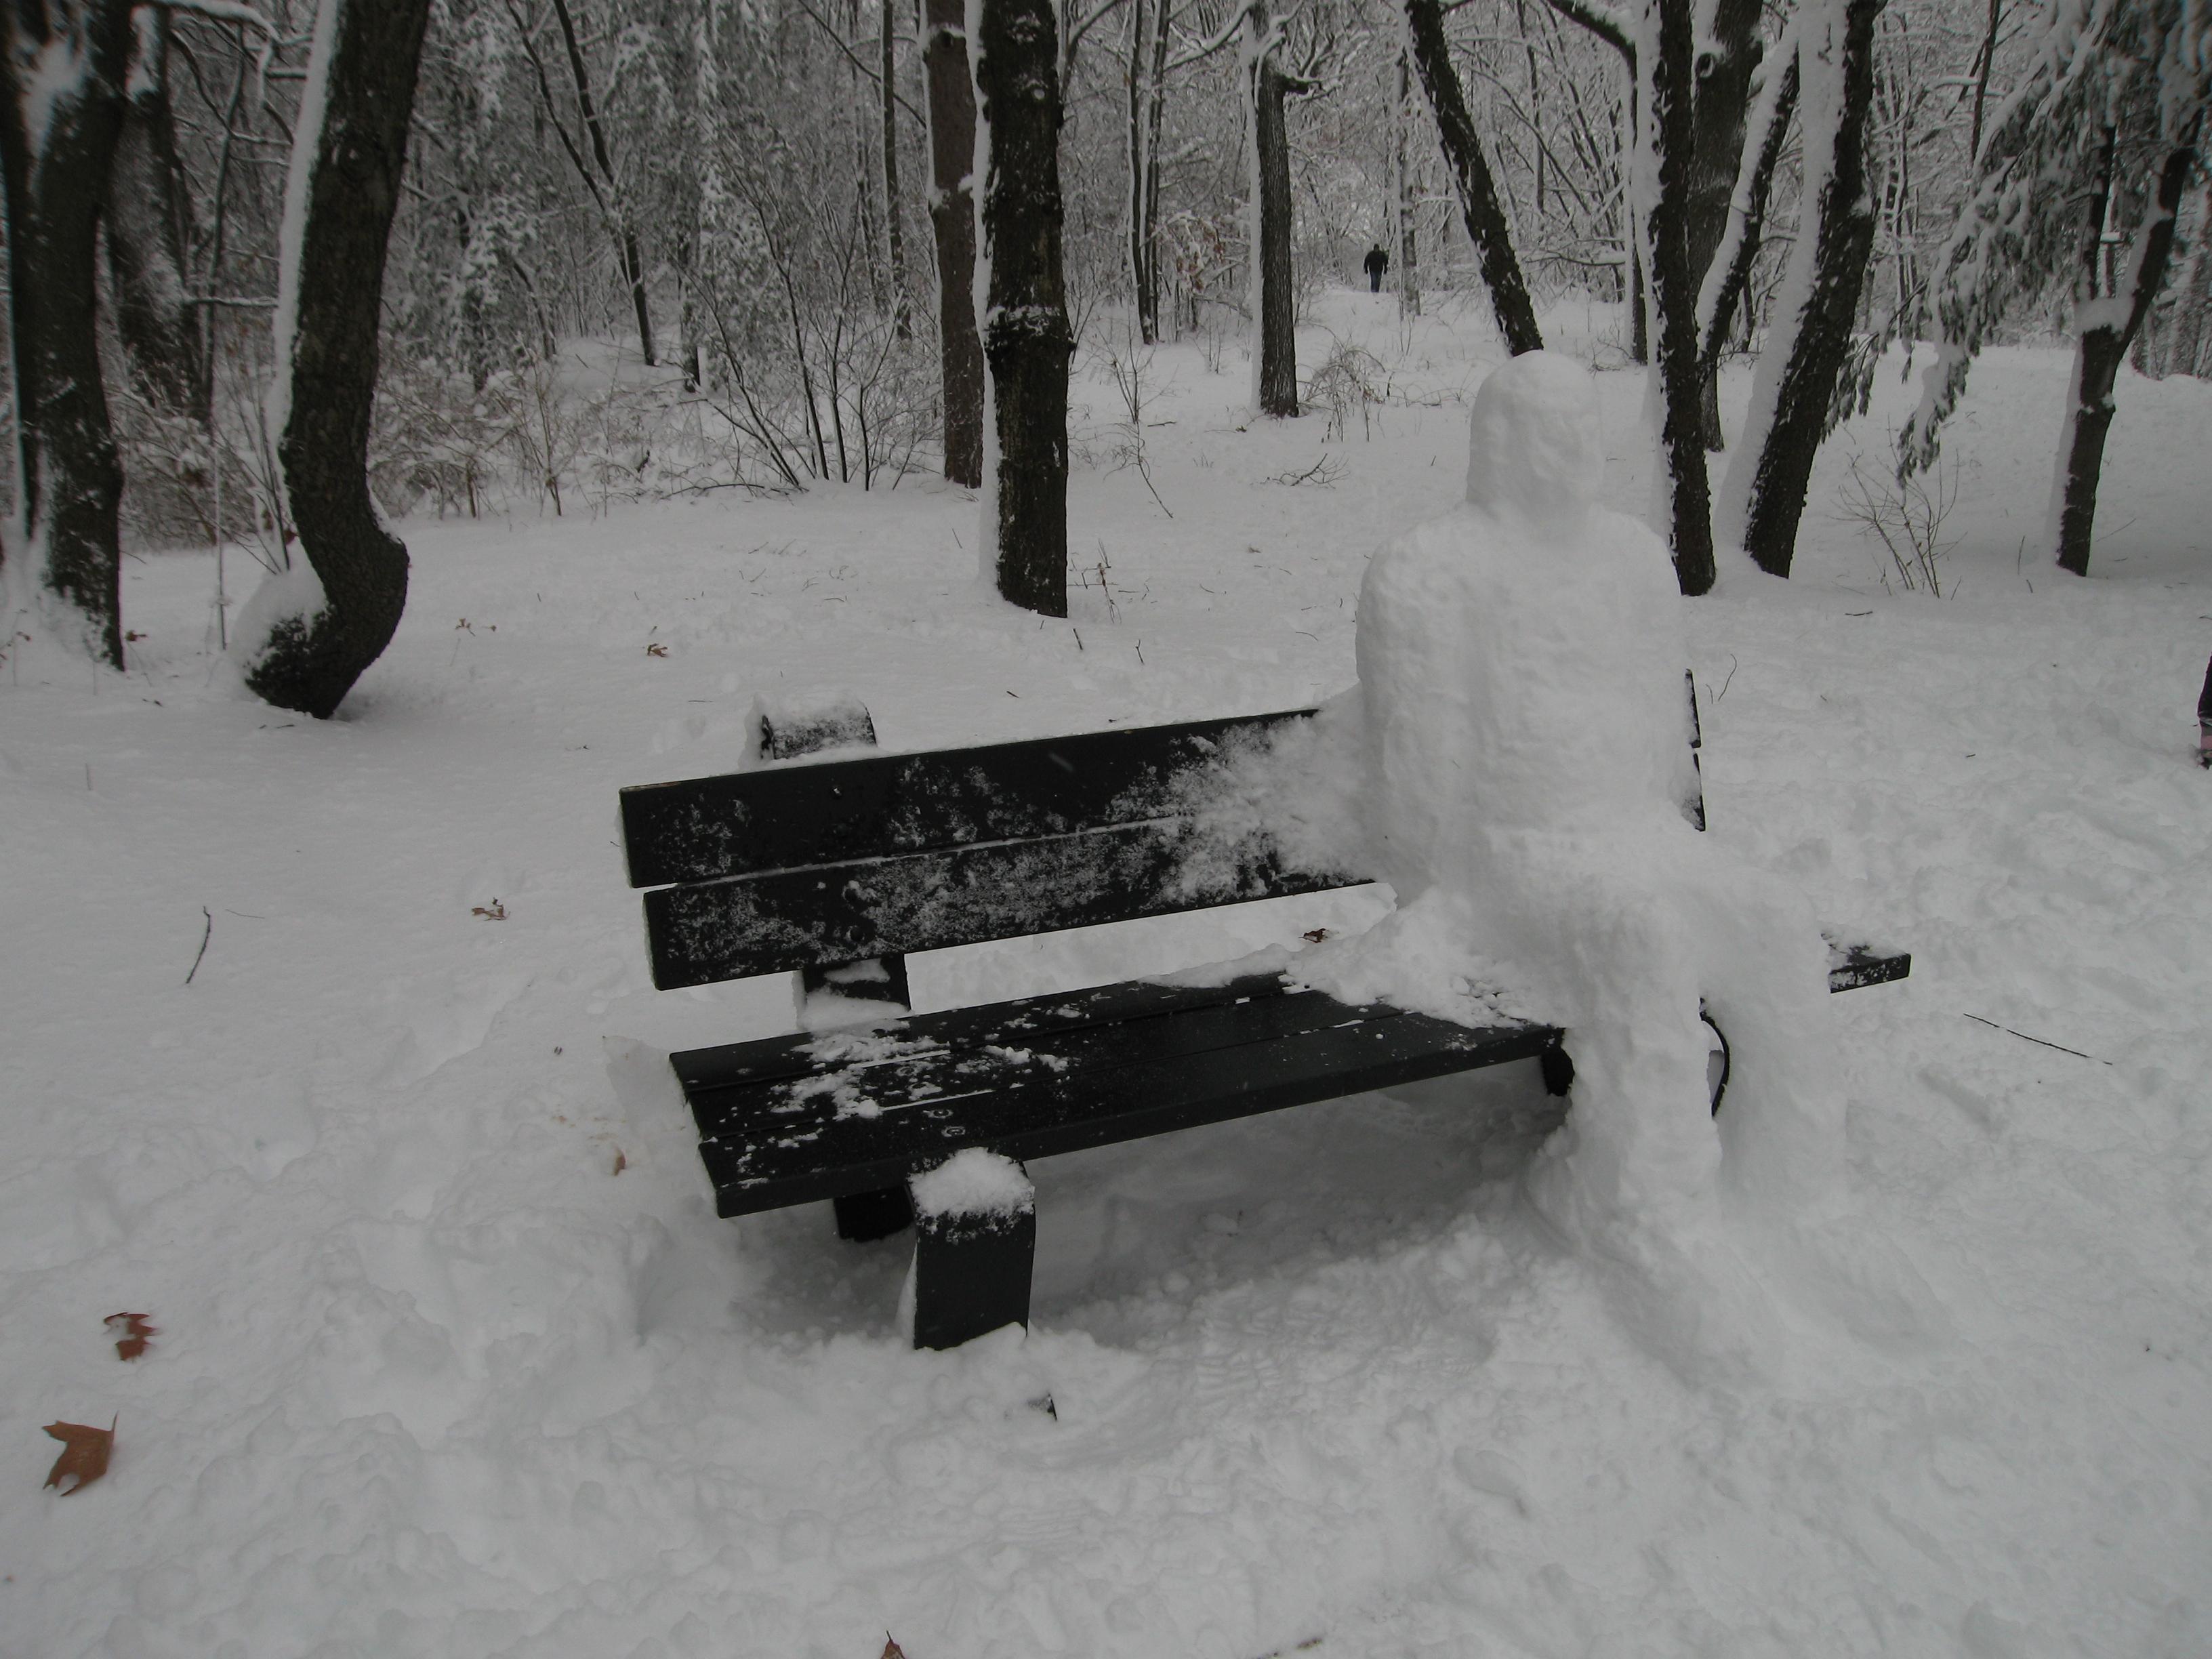 Photo: A snow person